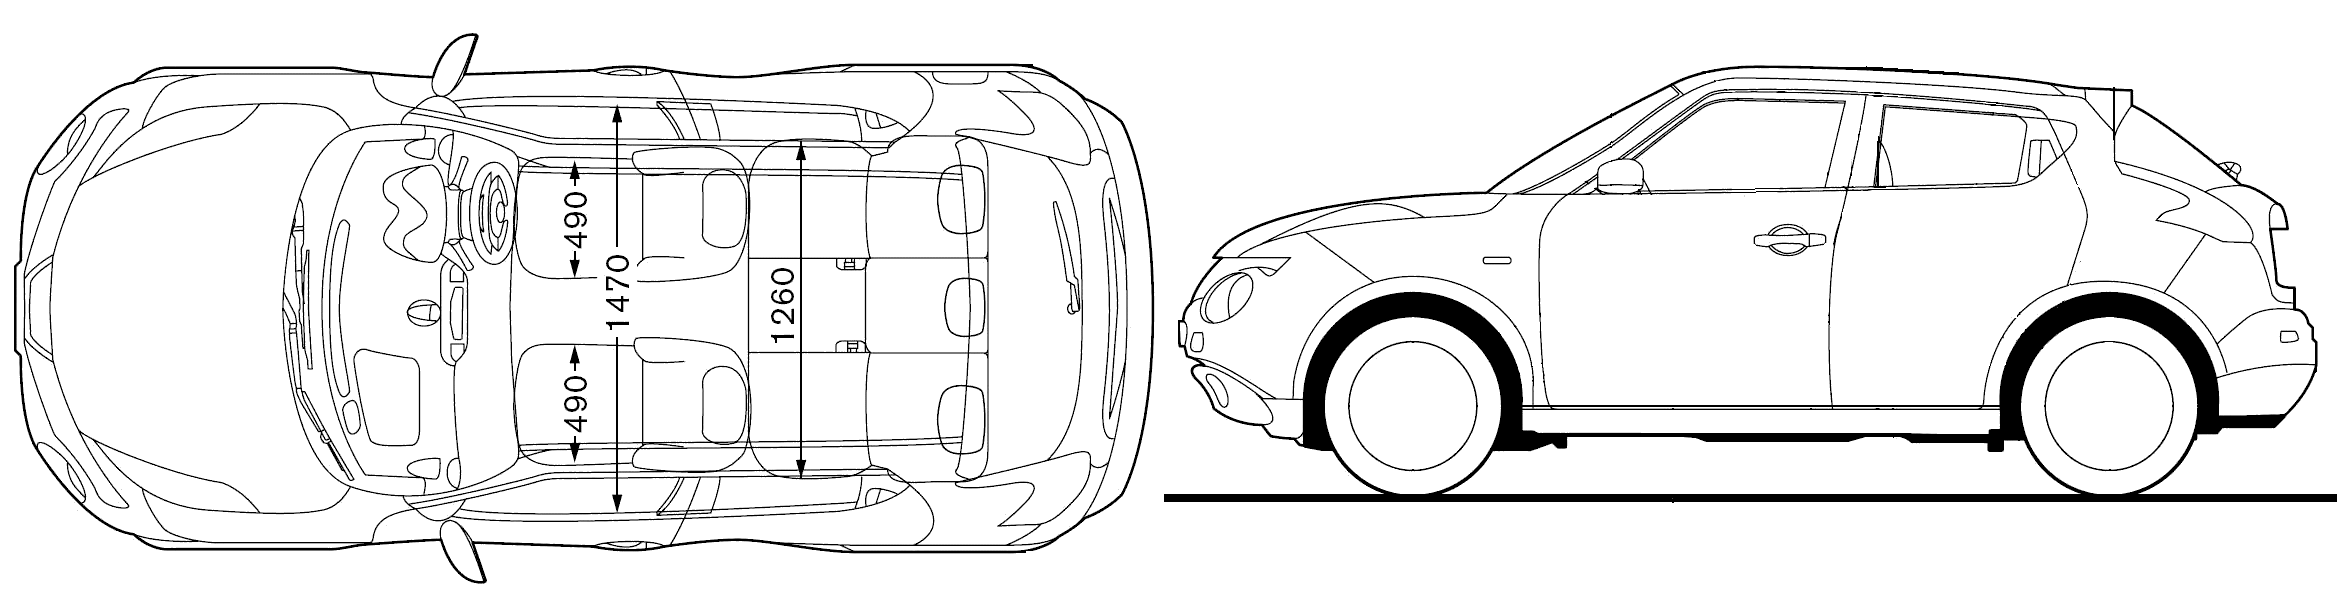 car blueprints nissan juke blueprints vector drawings clipart and pdf templates. Black Bedroom Furniture Sets. Home Design Ideas